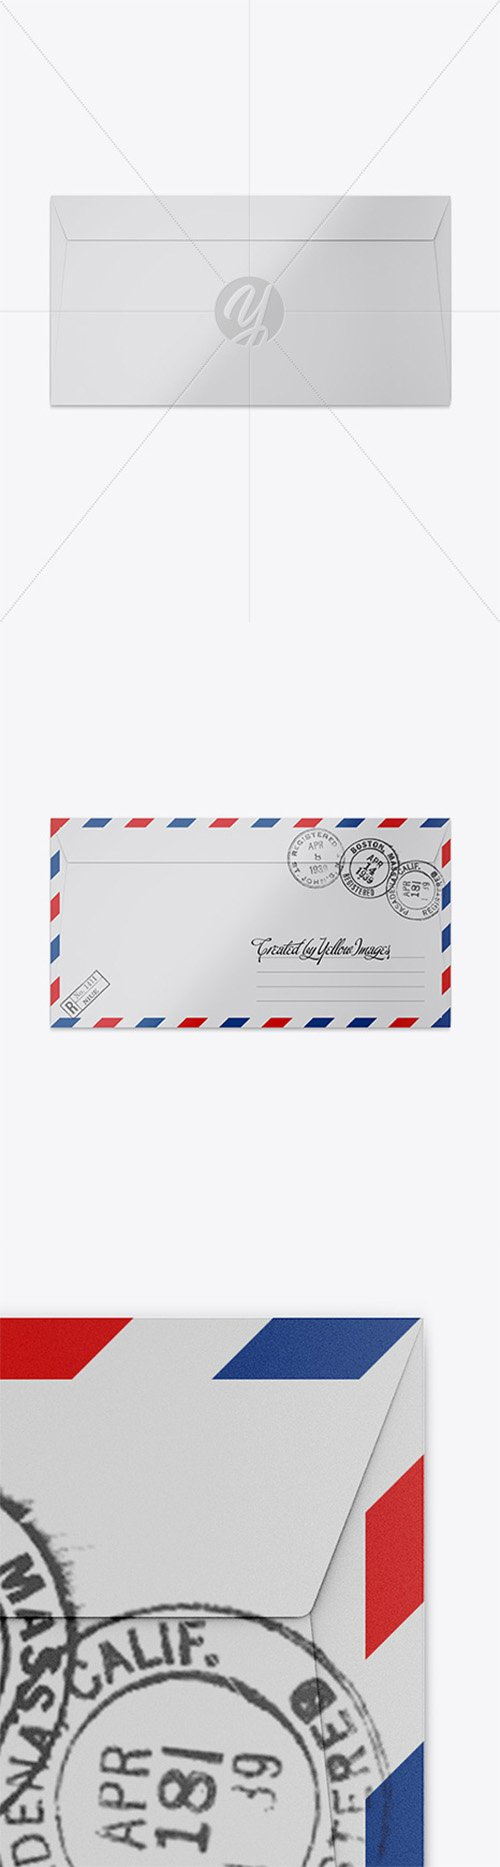 Paper Envelope Mockup 23436 TIF